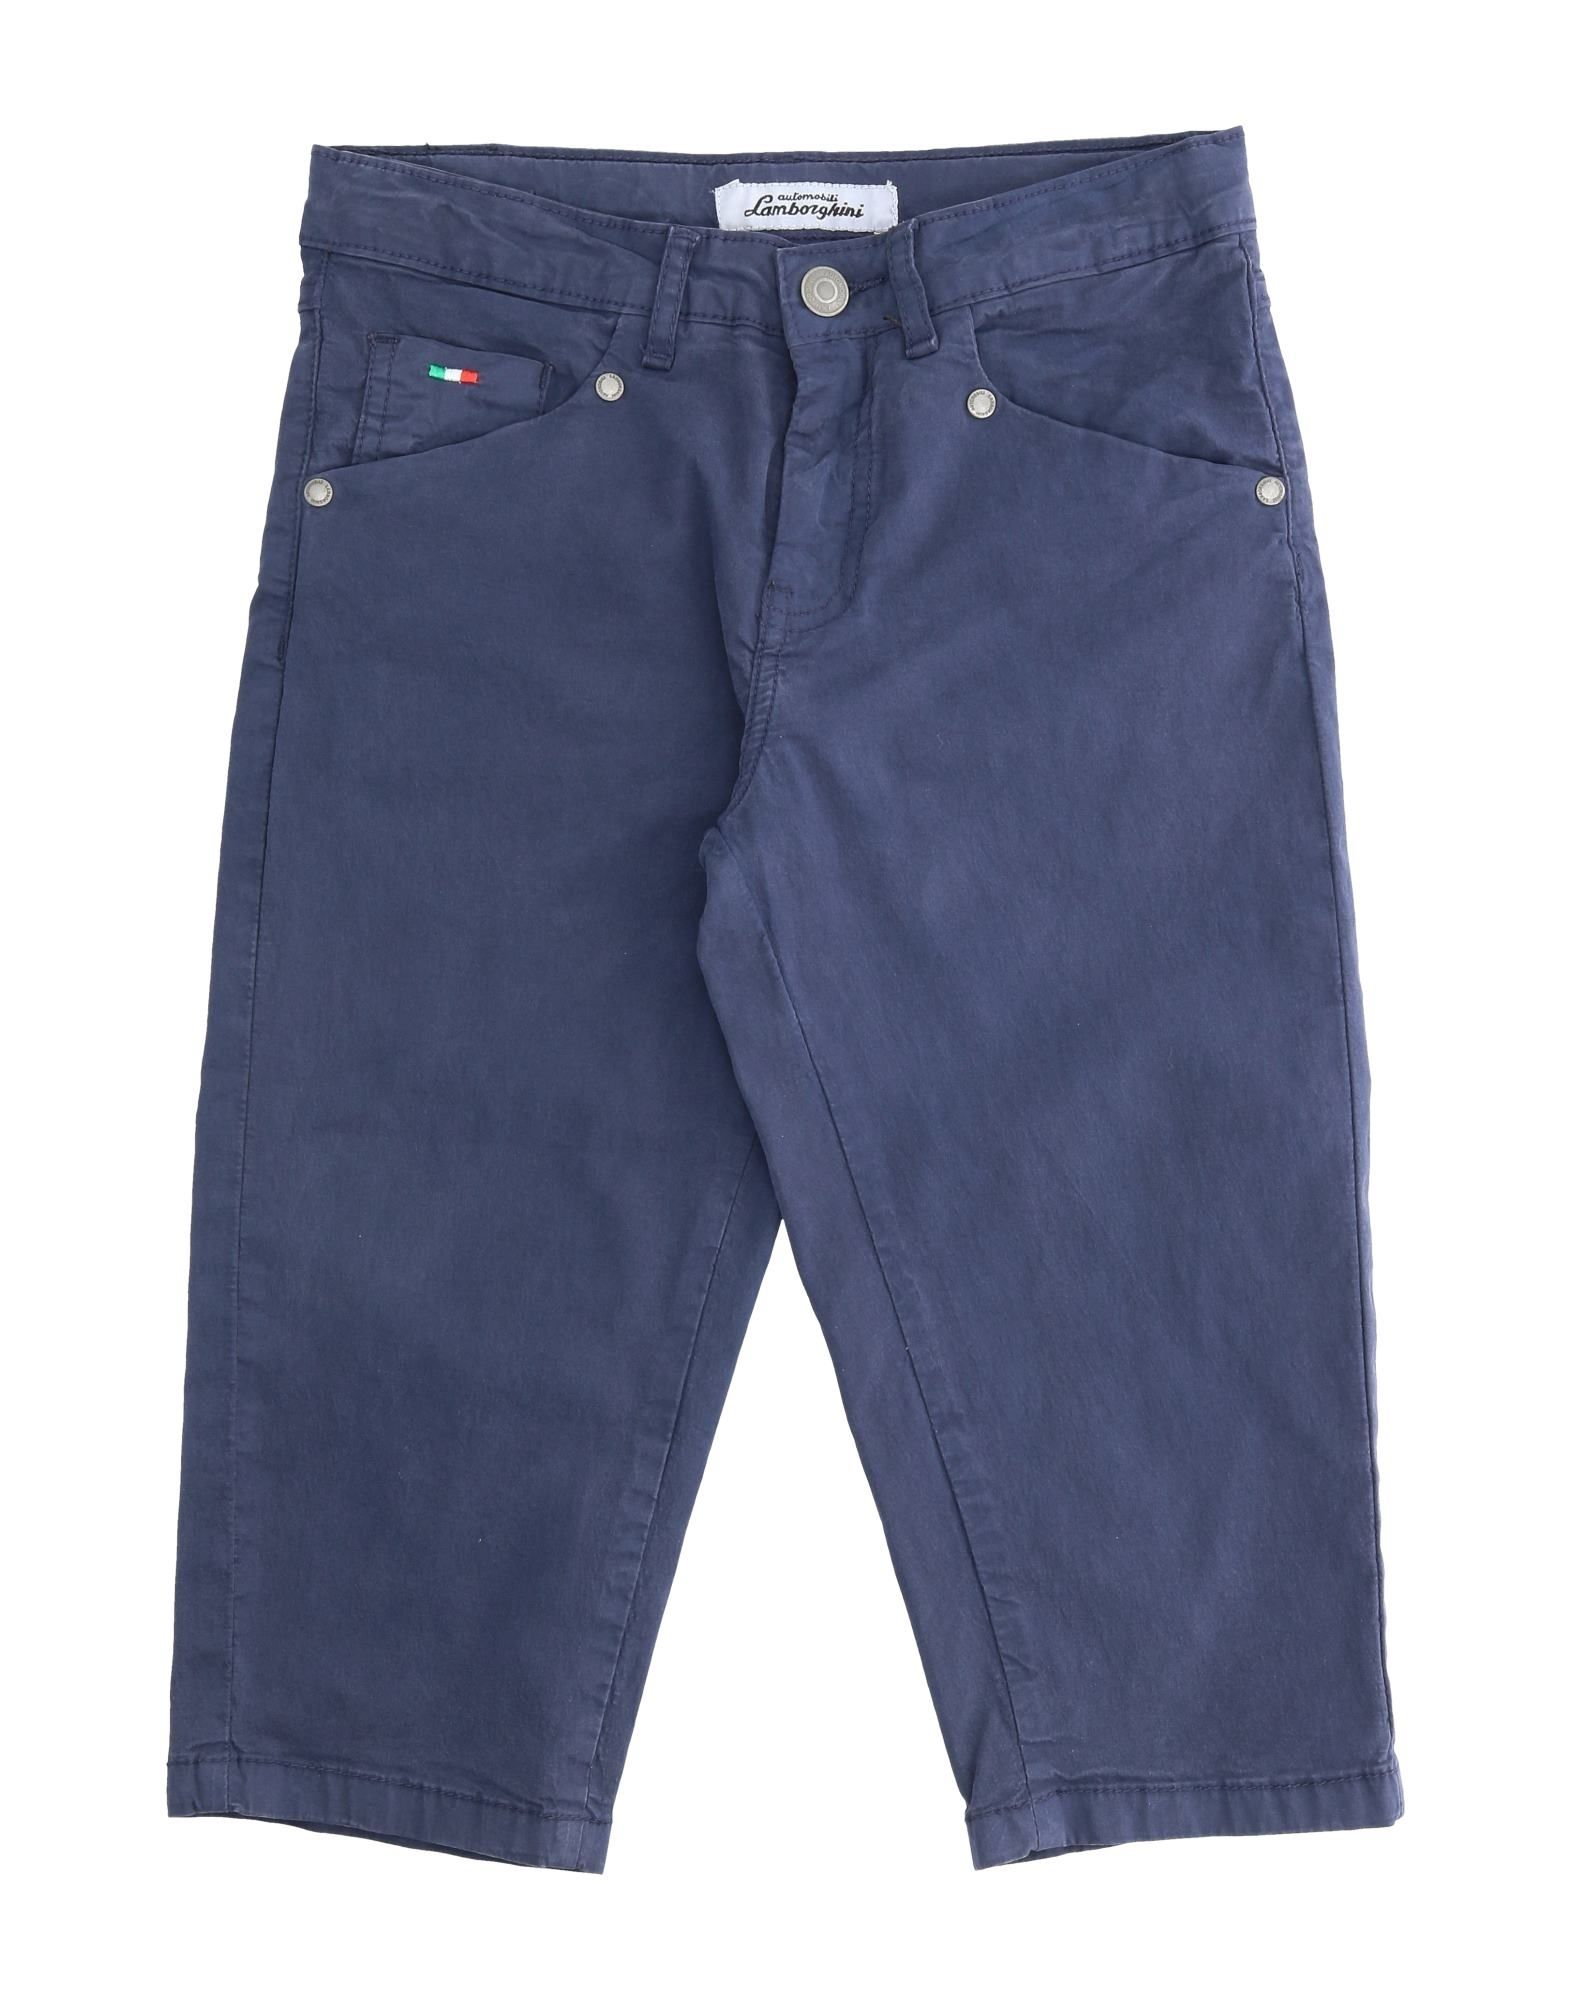 Фото - AUTOMOBILI LAMBORGHINI Повседневные брюки automobili lamborghini повседневные брюки